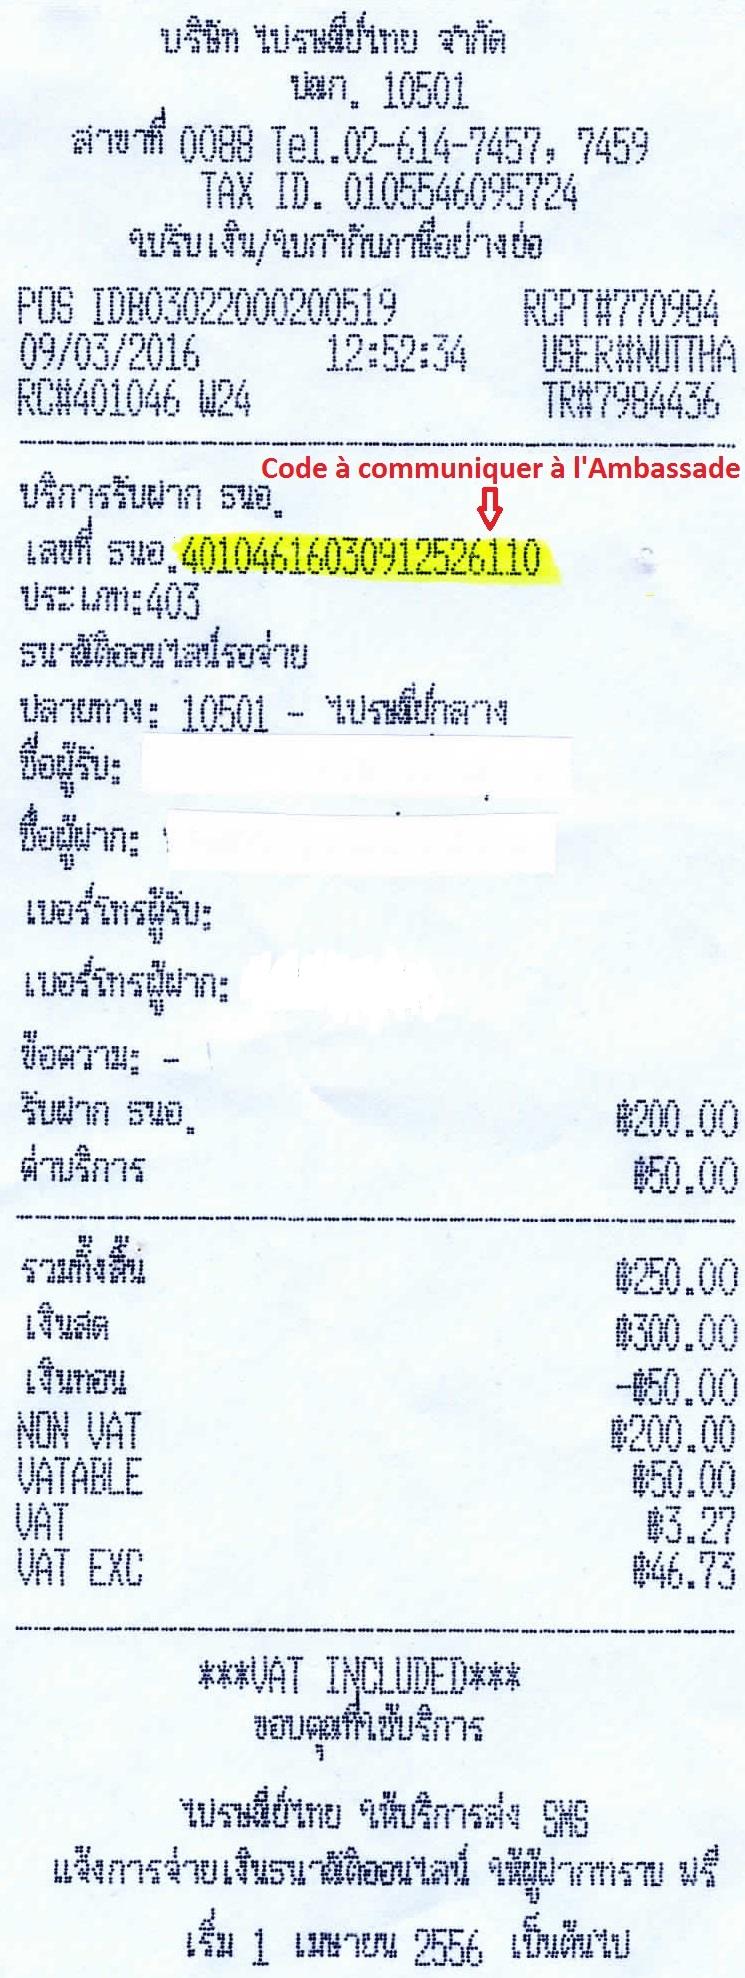 Attestations Certificats Declarations La France En Thailande